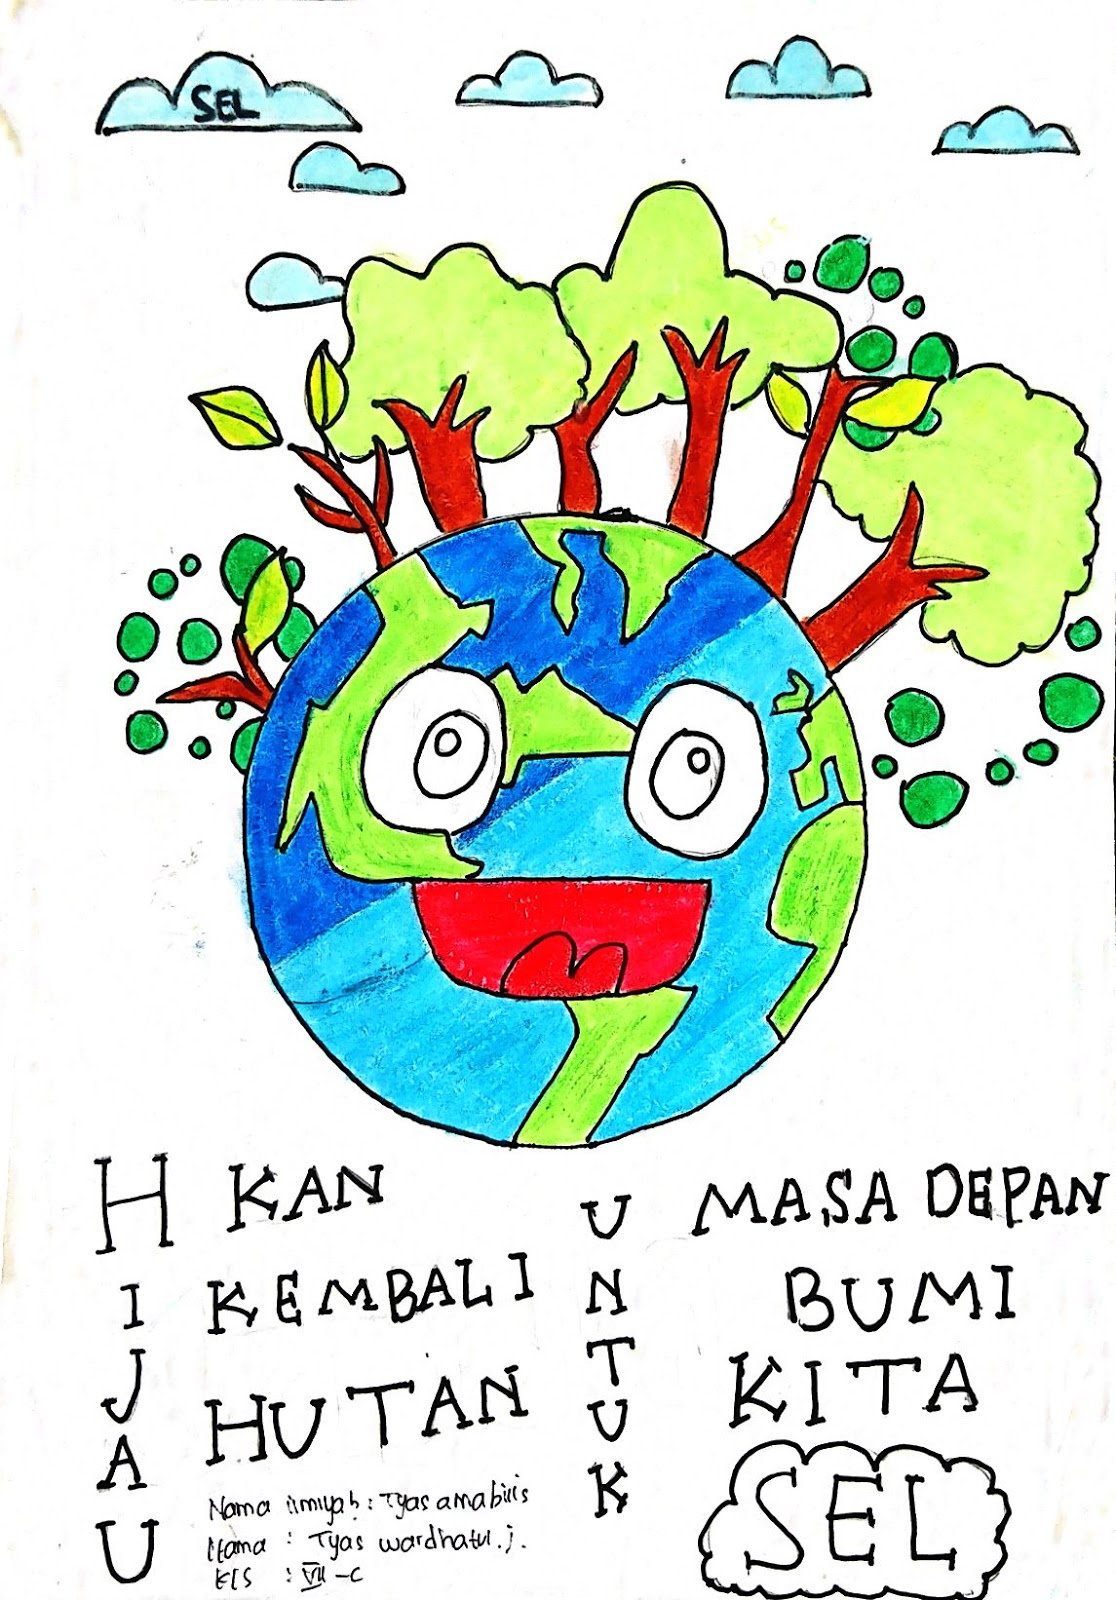 Goresan Warna Tentang Bumi Kita